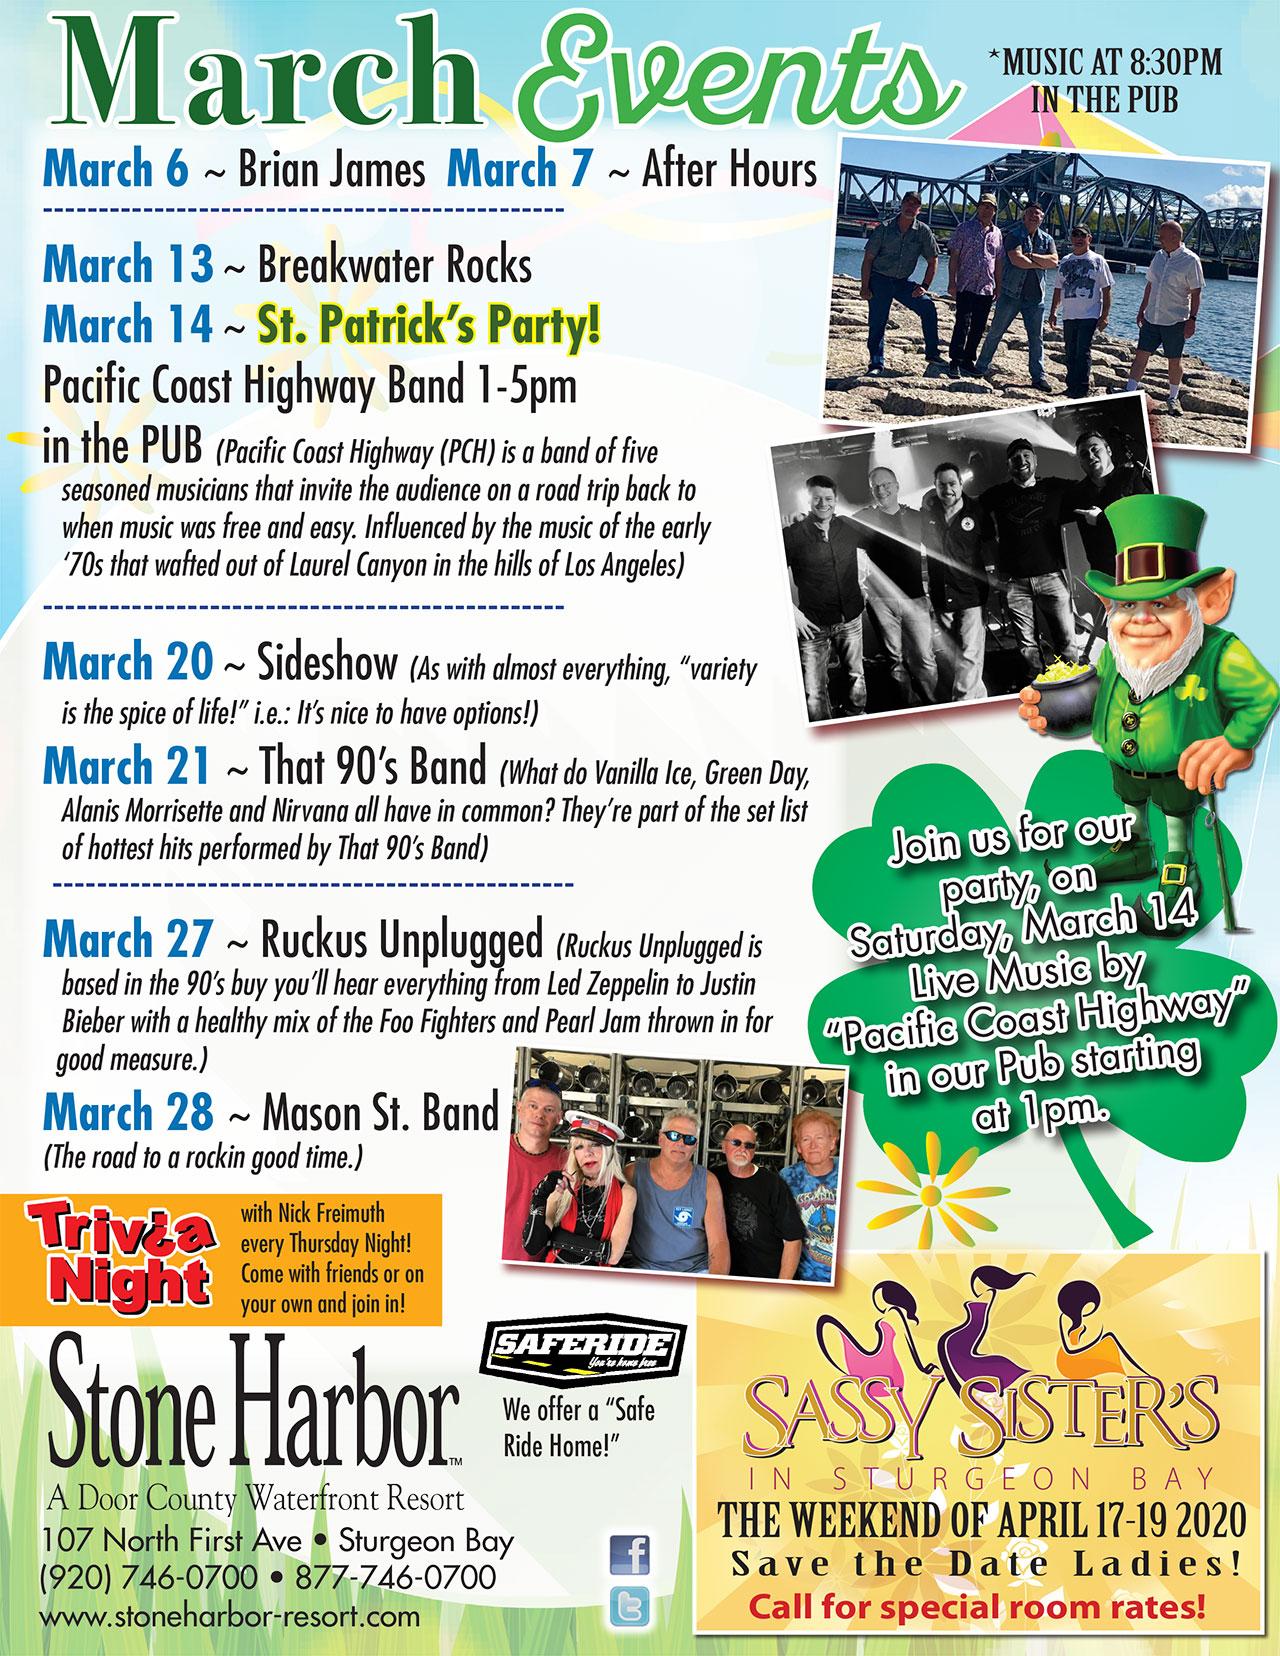 march events,live entertainment,door county,stone harbor resort,stone harbor pub